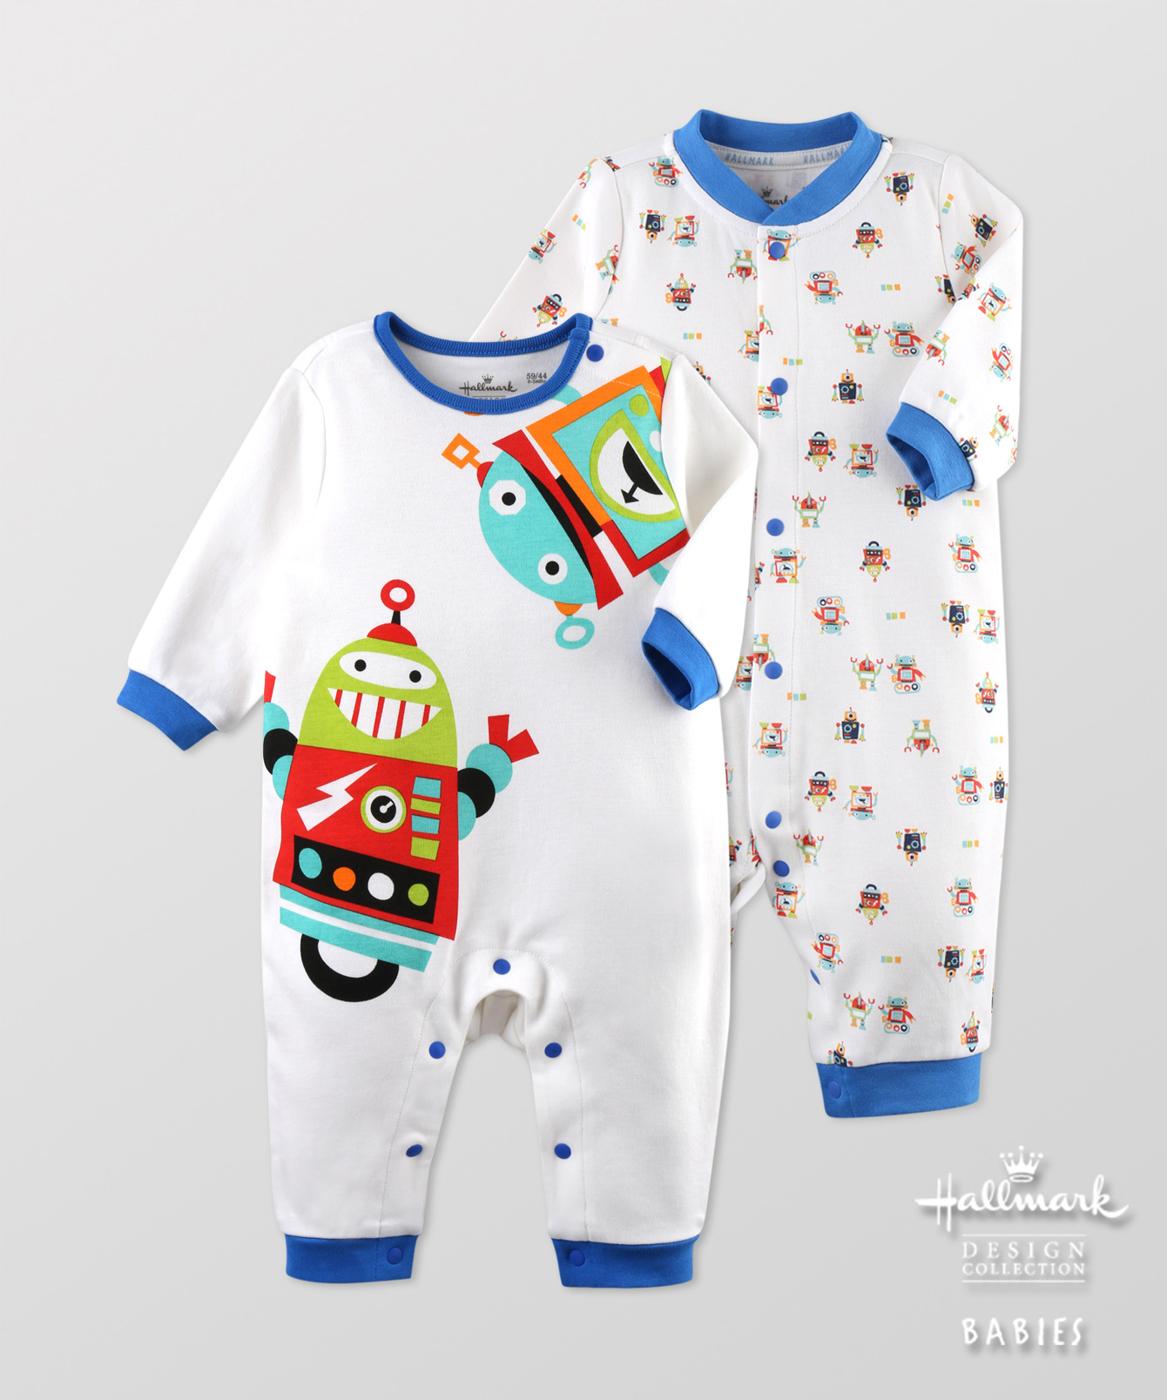 Hallmark Babies男嬰機器人秋冬純棉長袖爬服連身衣(兩件裝) HF3-B02-09-BB-MB